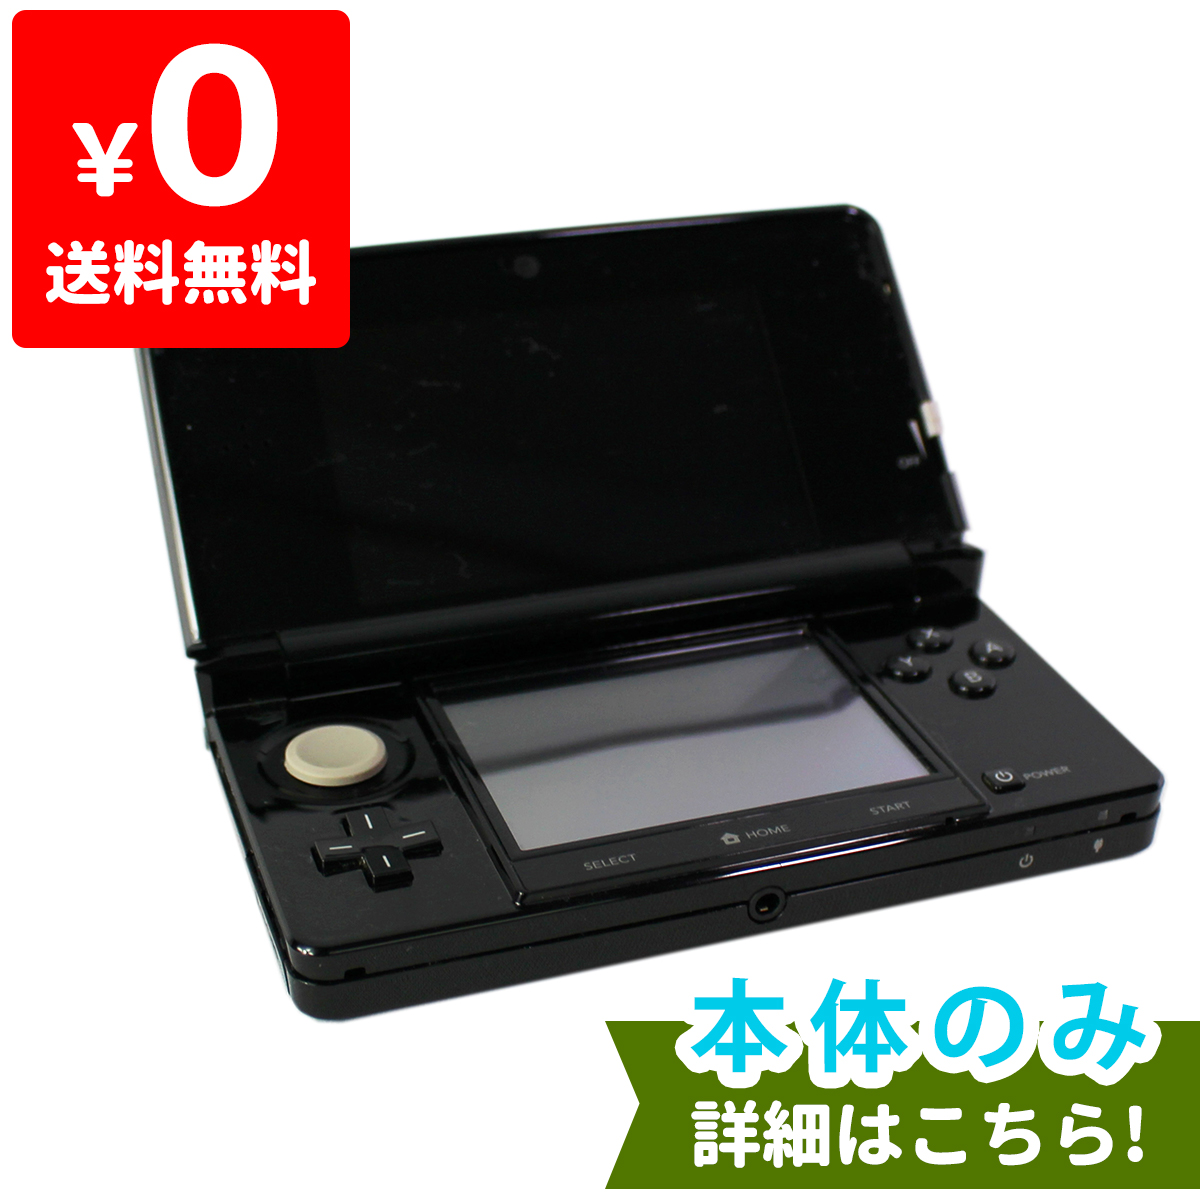 3DS ニンテンドー3DS クリアブラック(CTR-S-WEBA) 本体のみ タッチペン付き Nintendo 任天堂 ニンテンドー 中古 4902370520804 送料無料 【中古】